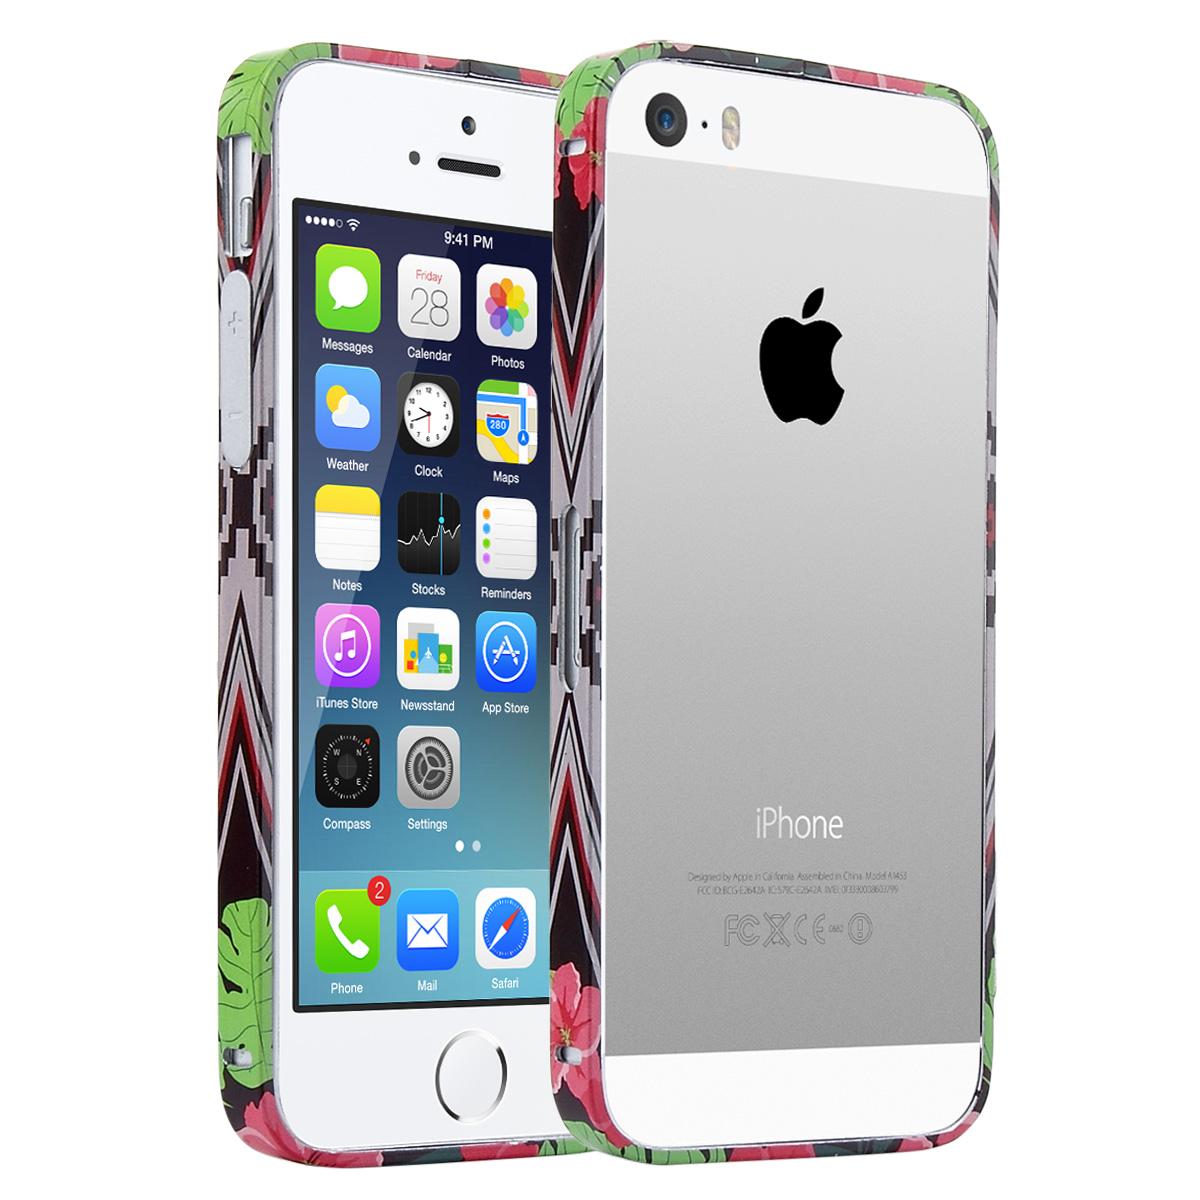 Iphone 5s Case Iphone 5 5s Se Bumper Case Ulak Slim Aluminum Metal